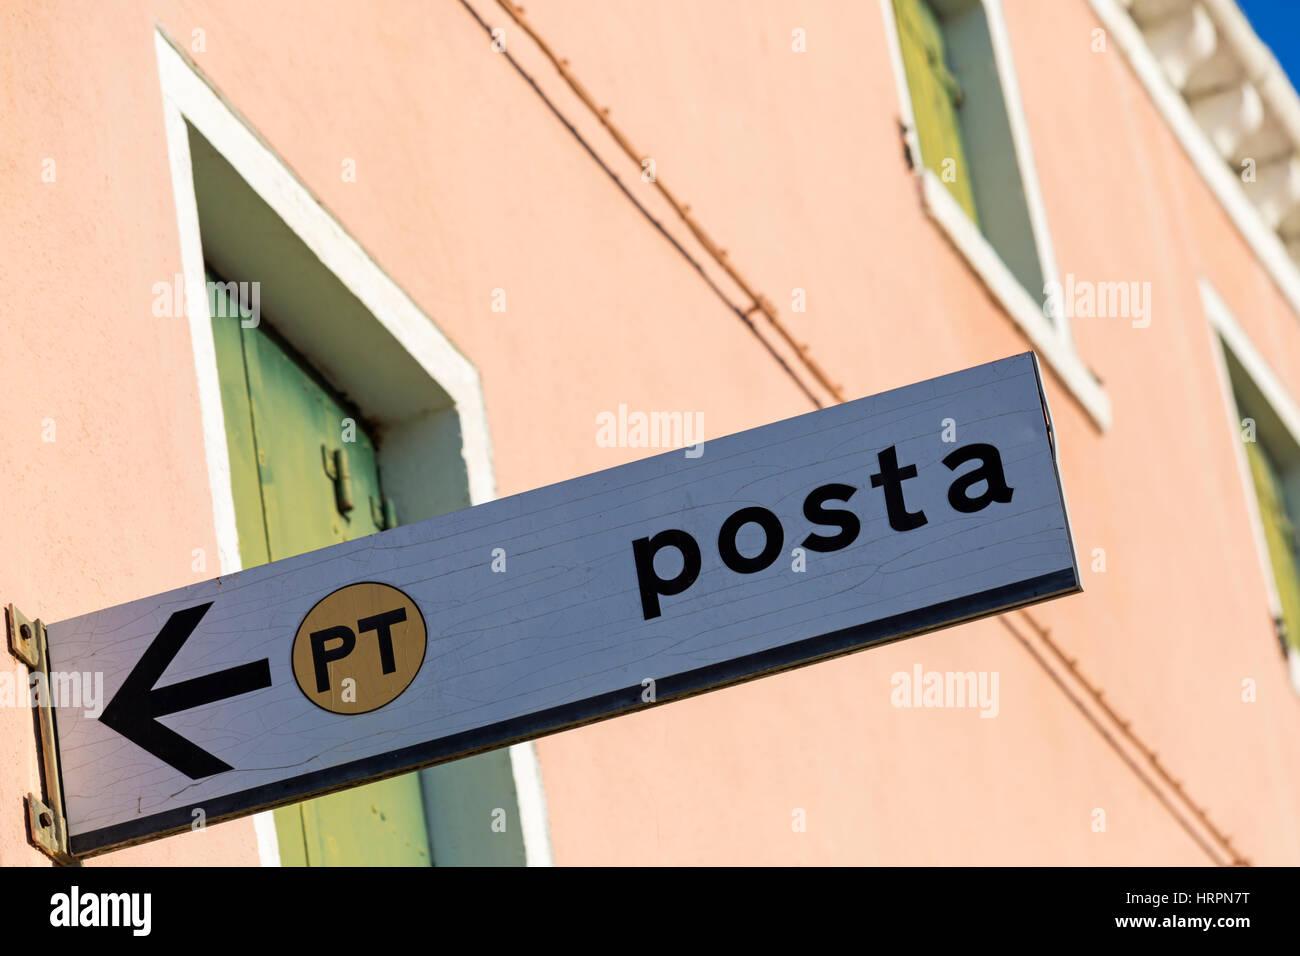 Posta sign at Burano, Venice, Italy in January - Stock Image